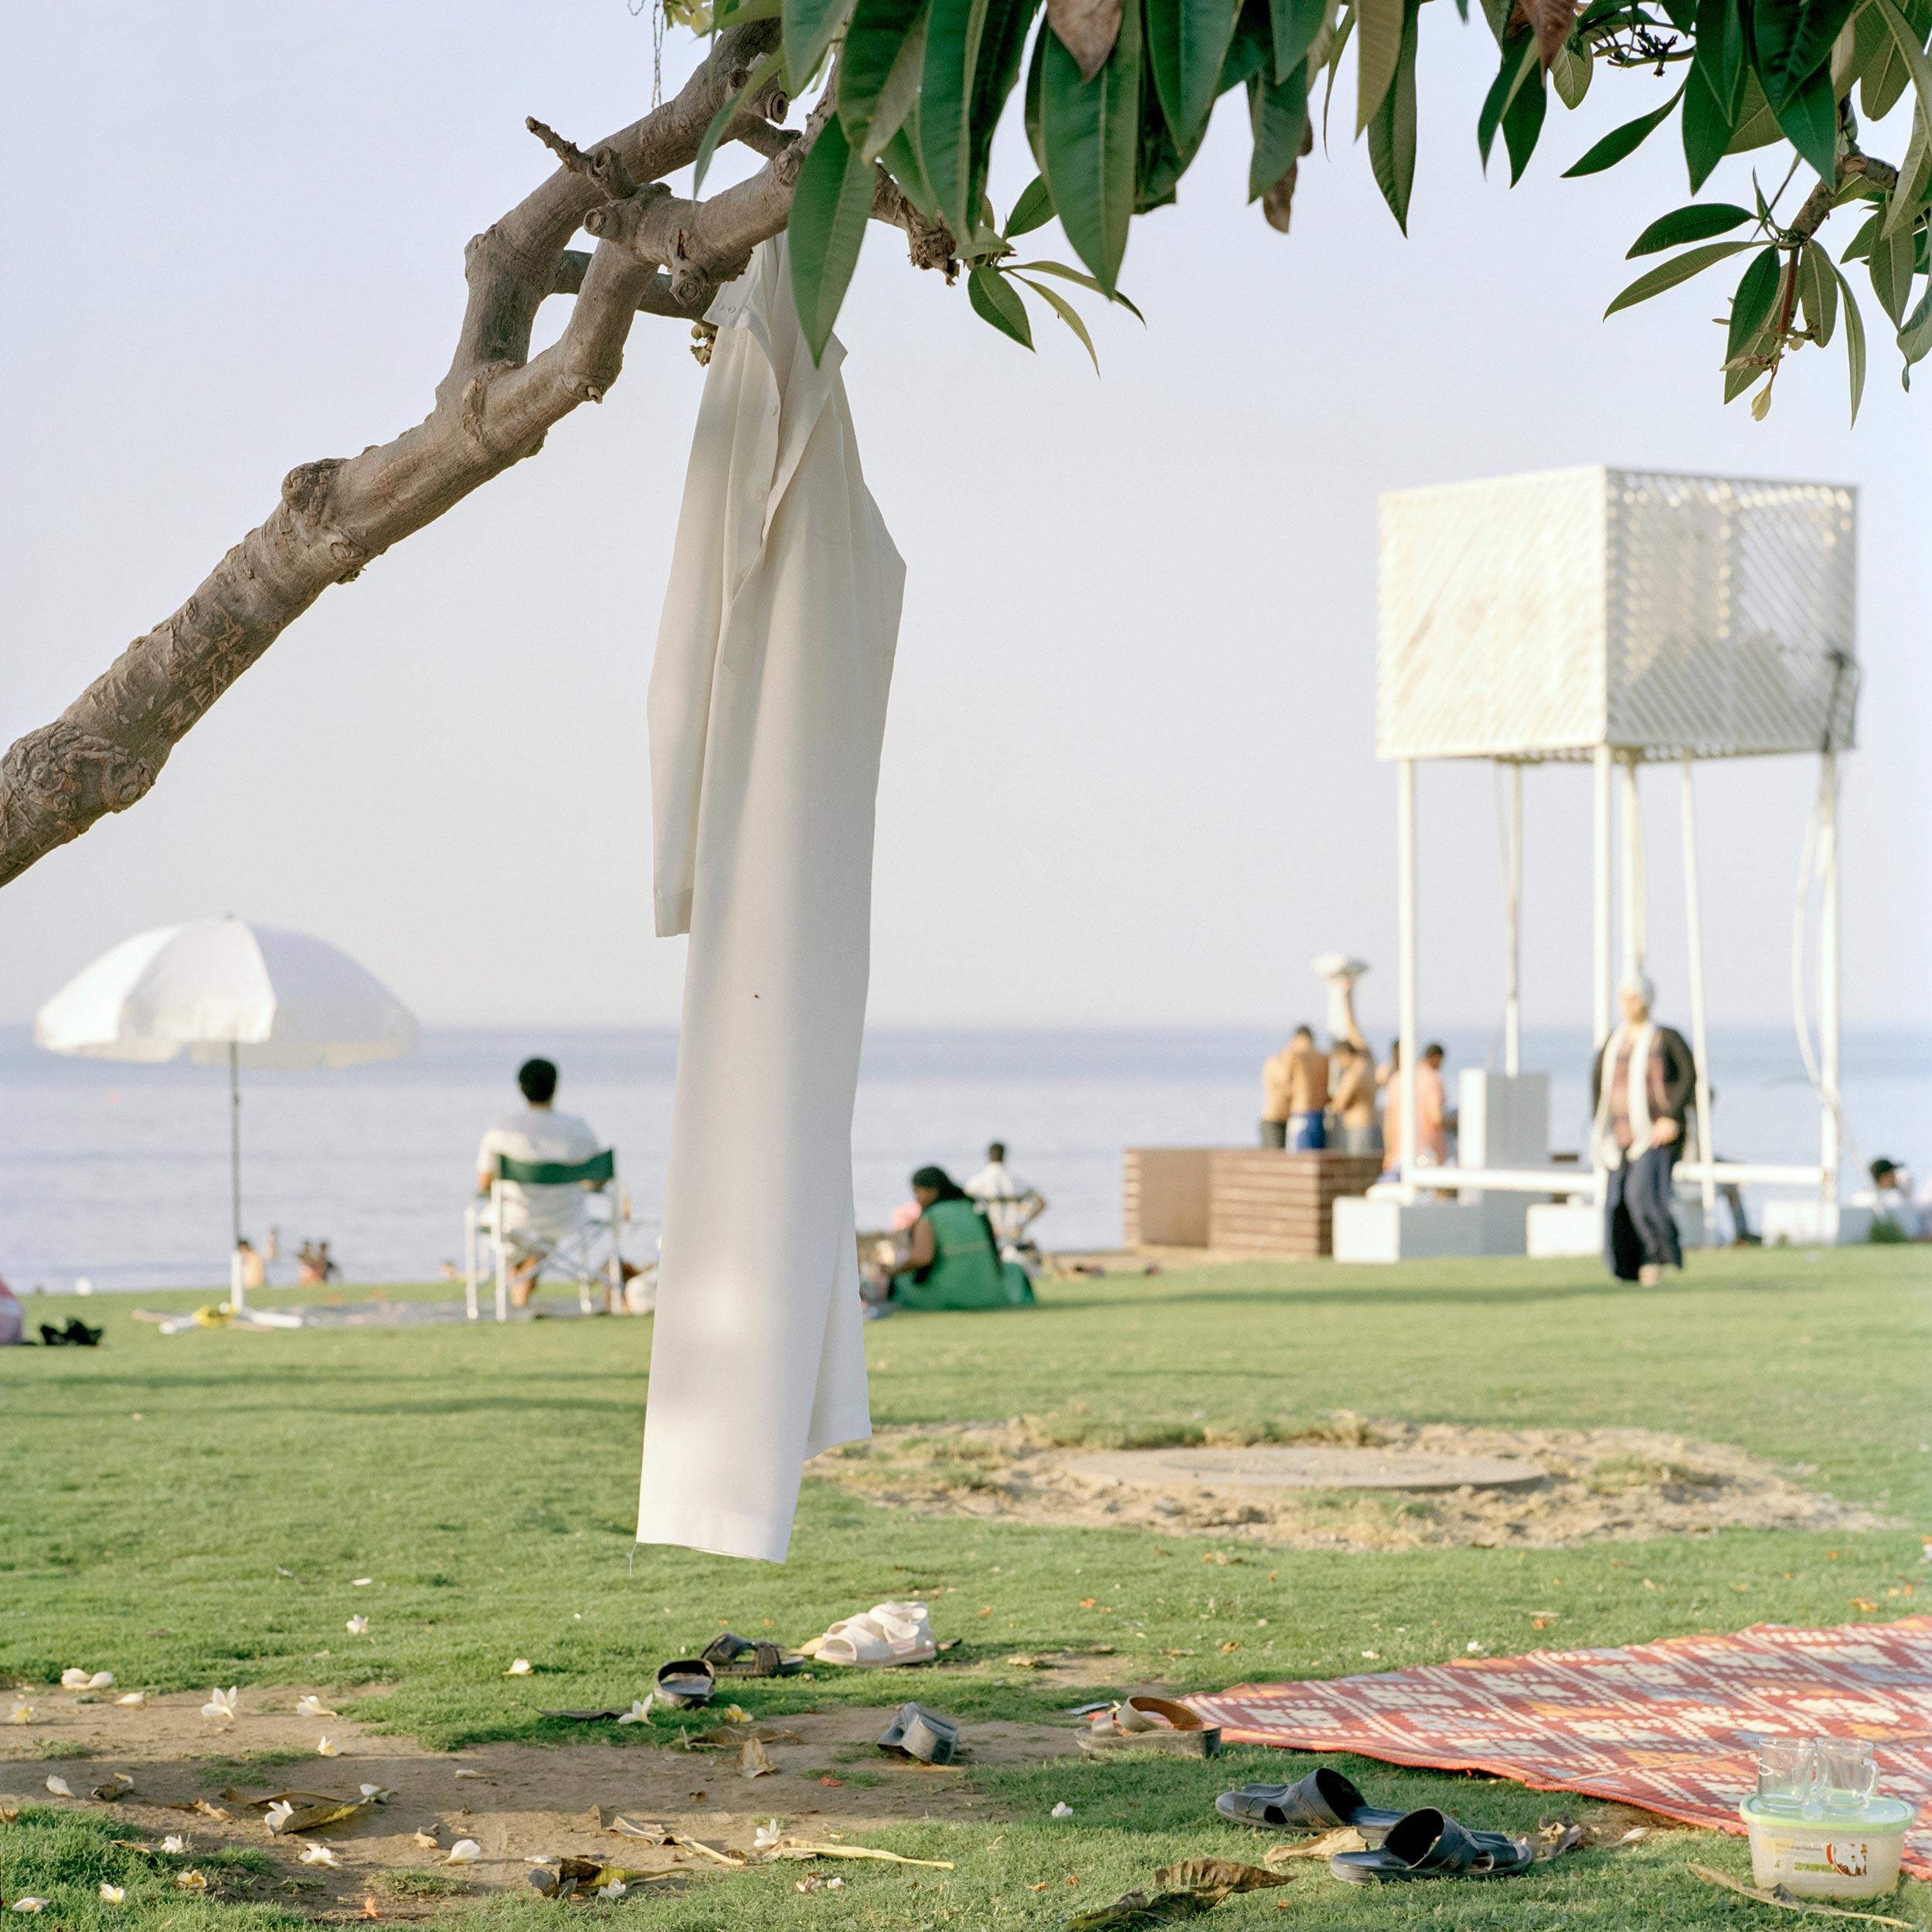 photograph of dishdasha on beach from series XO